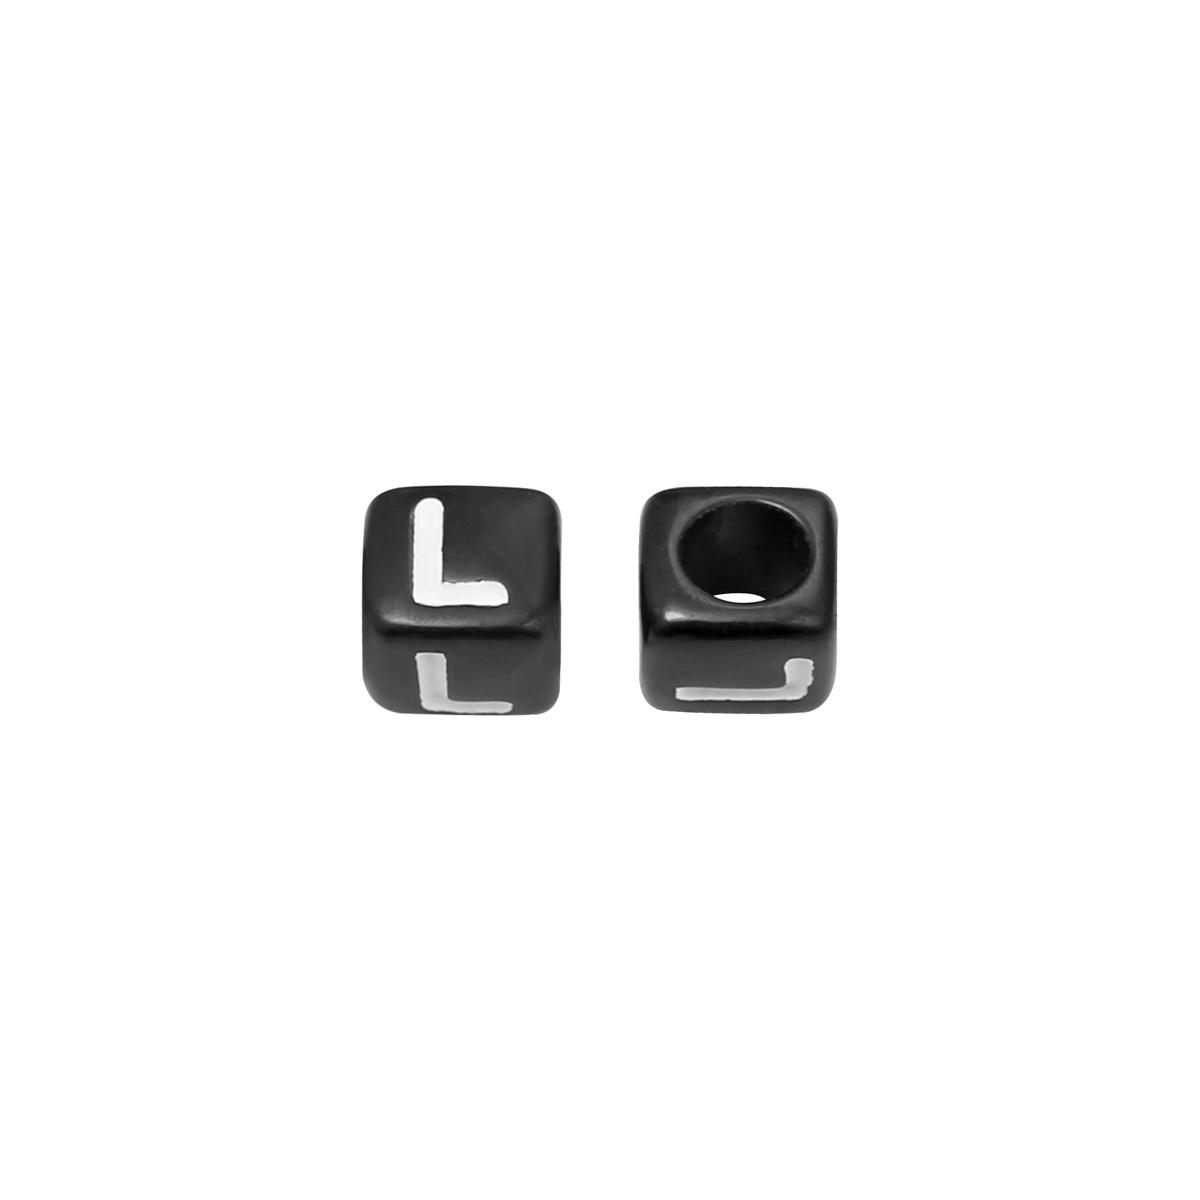 Perlen diy letter l - 6mm